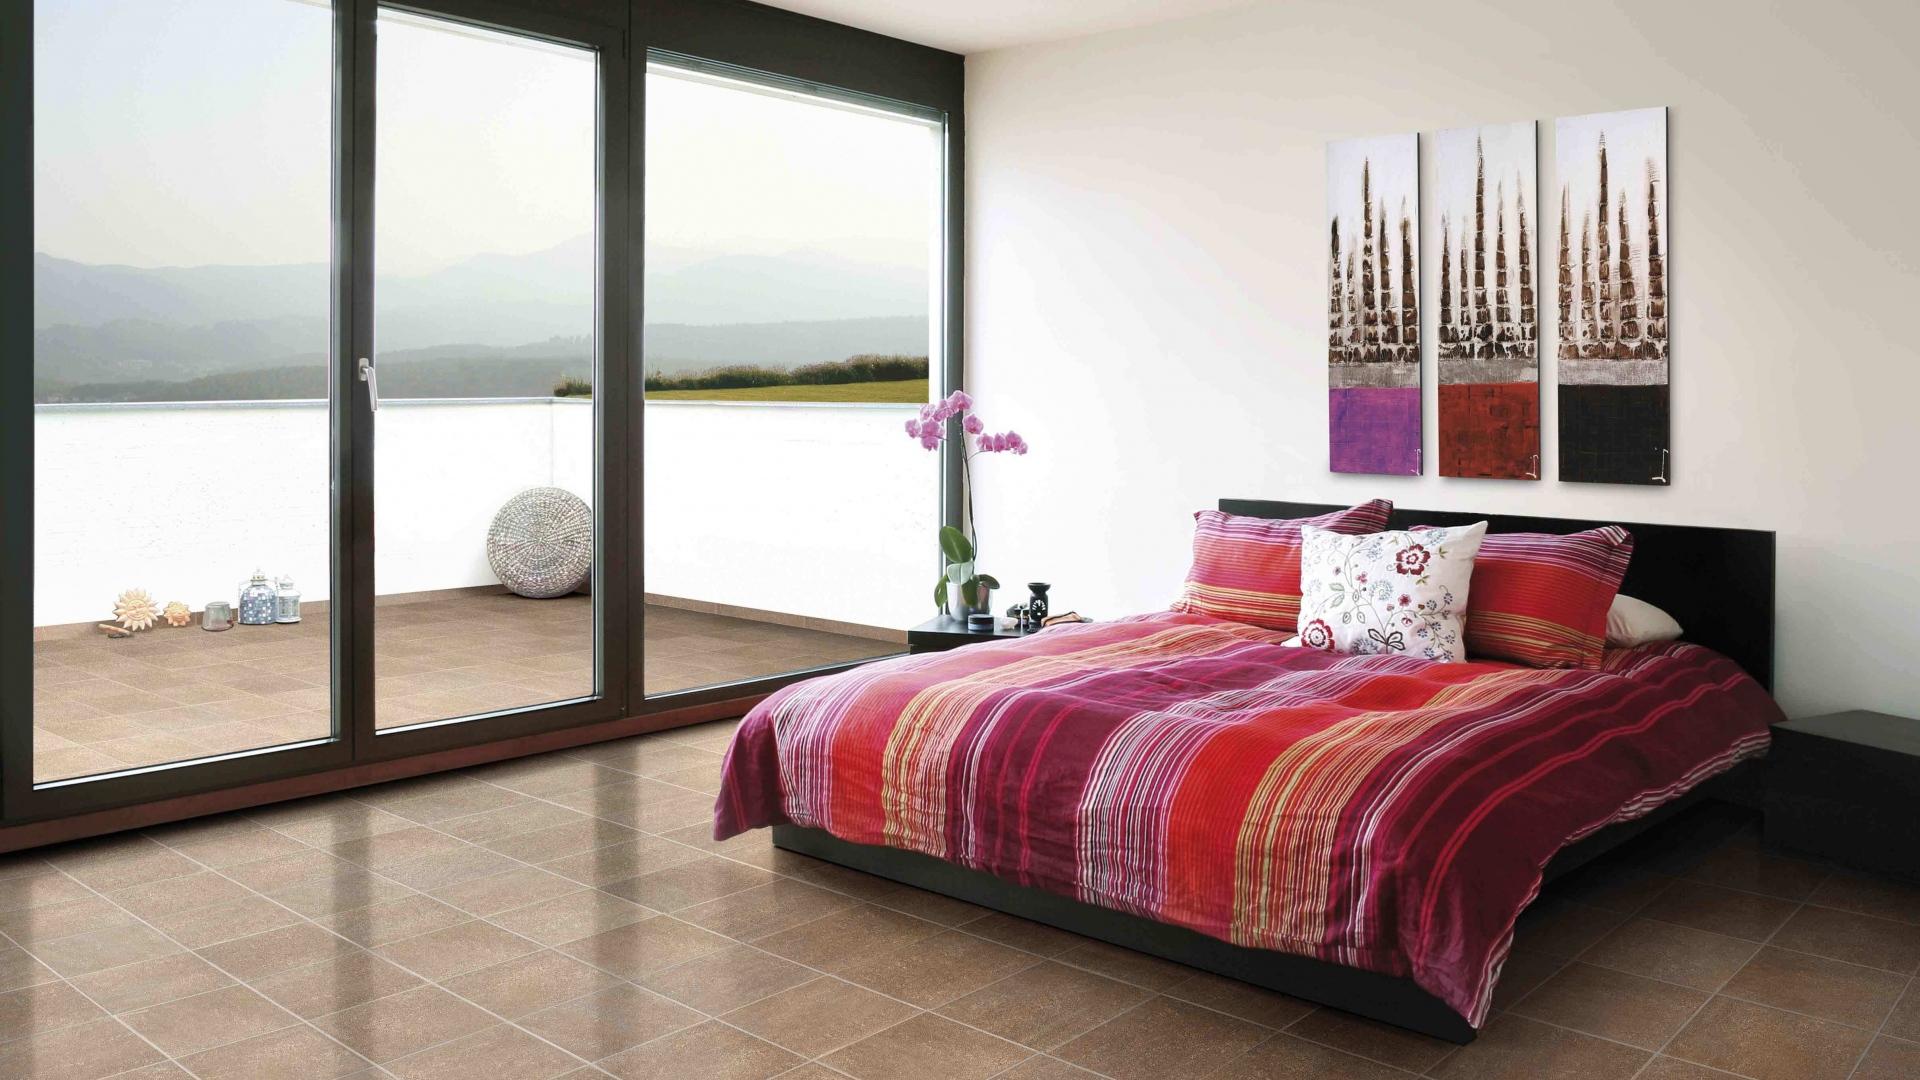 wallpaper for bedroom hdwallpaper for bedroom hd